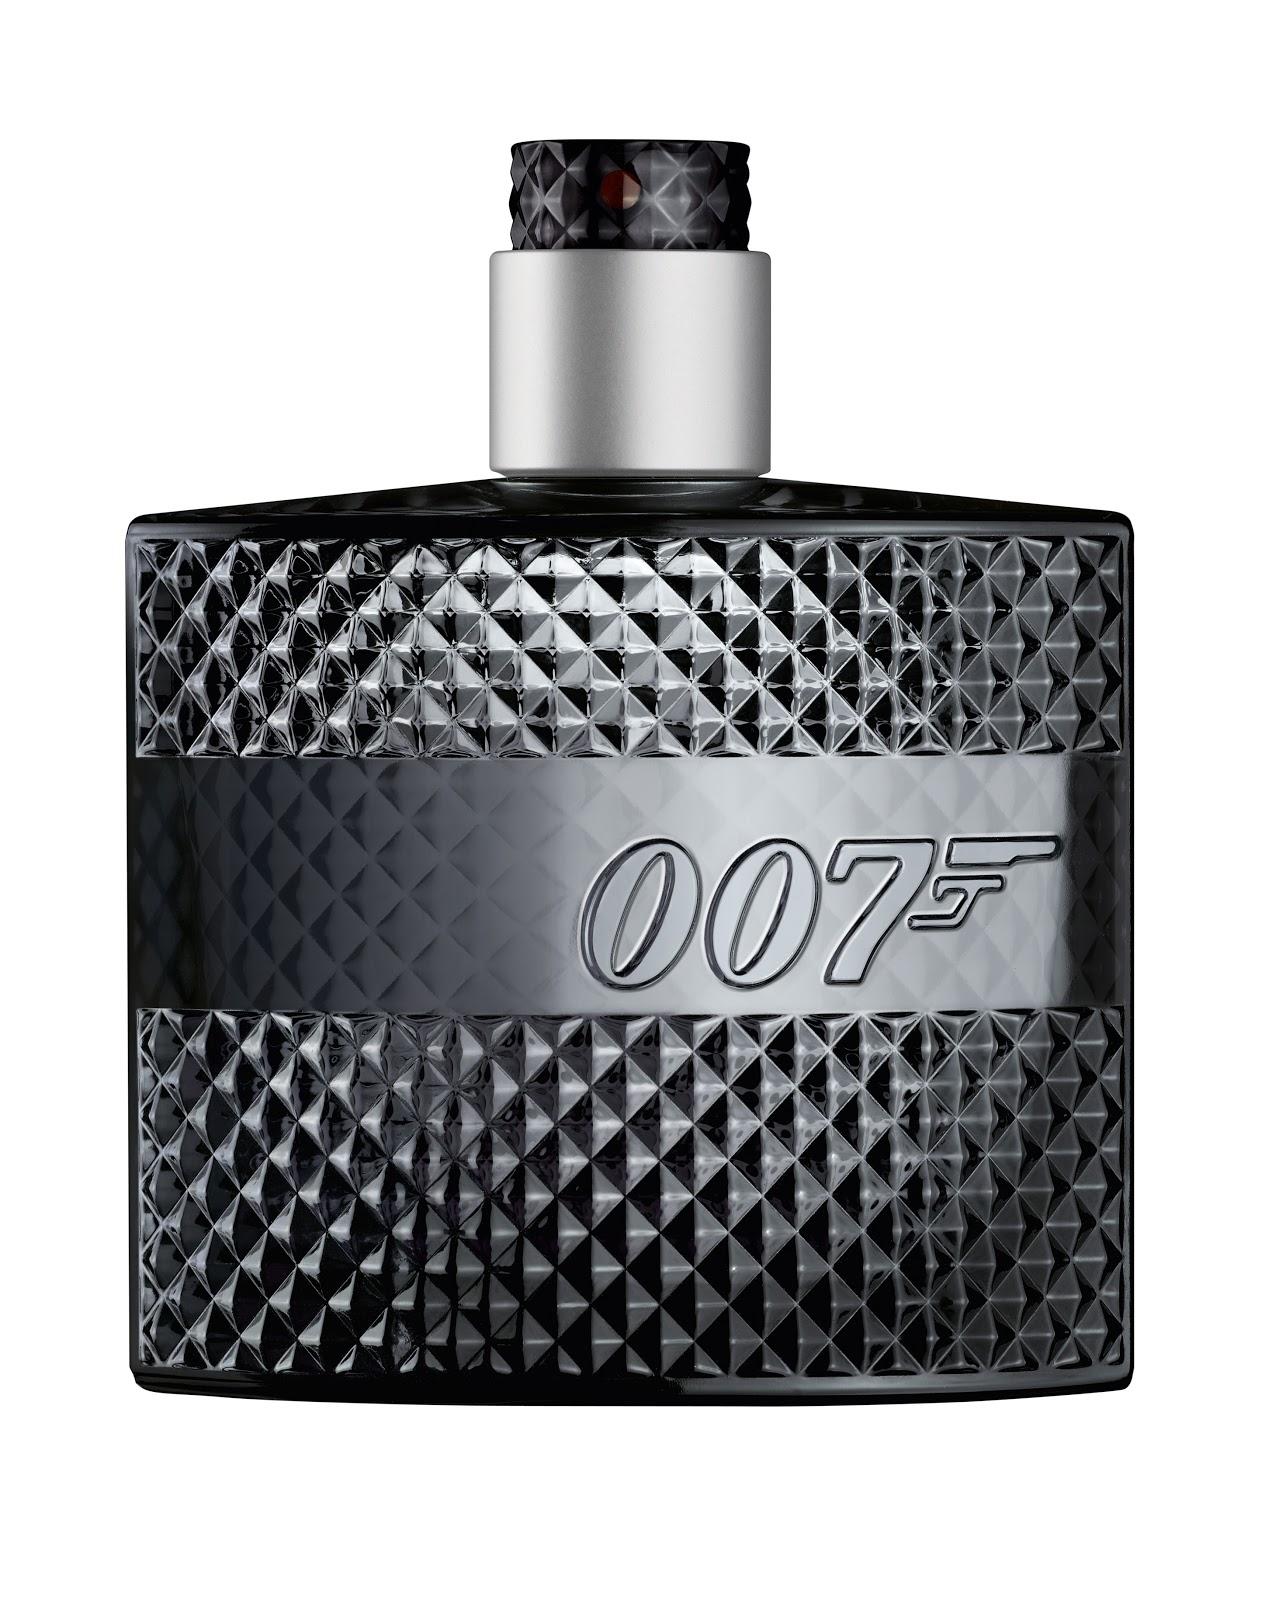 Smell like Bond, James Bond with the new James Bond 007 fragrance - Life & Soul Lifestyle